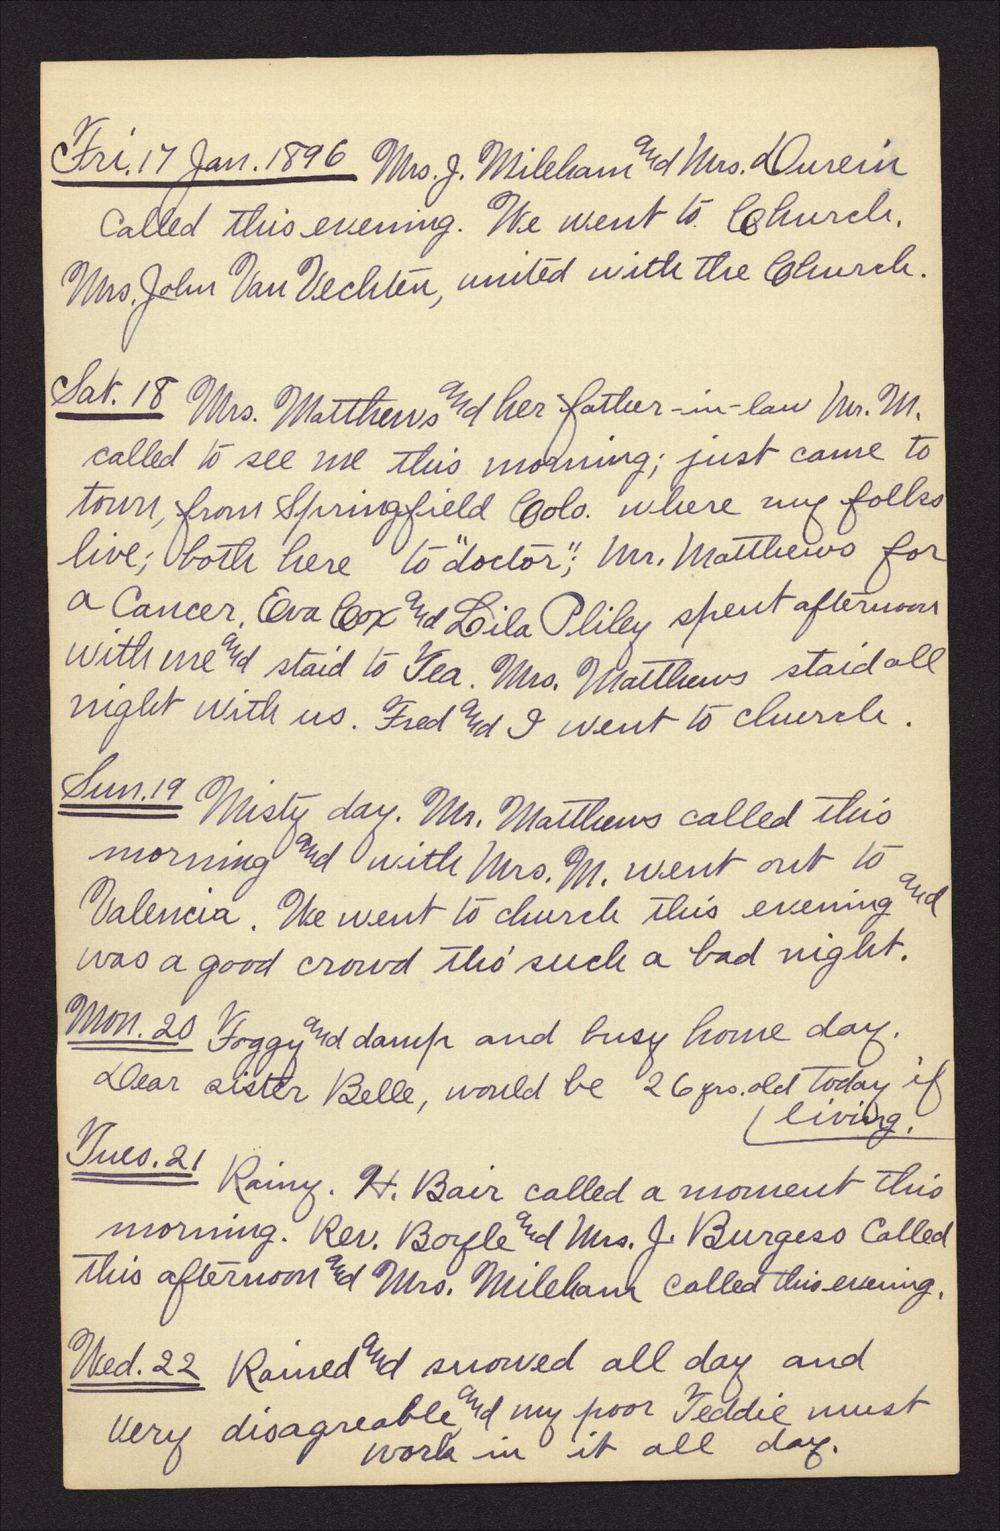 Martha Farnsworth diary - Jan 17, 1896